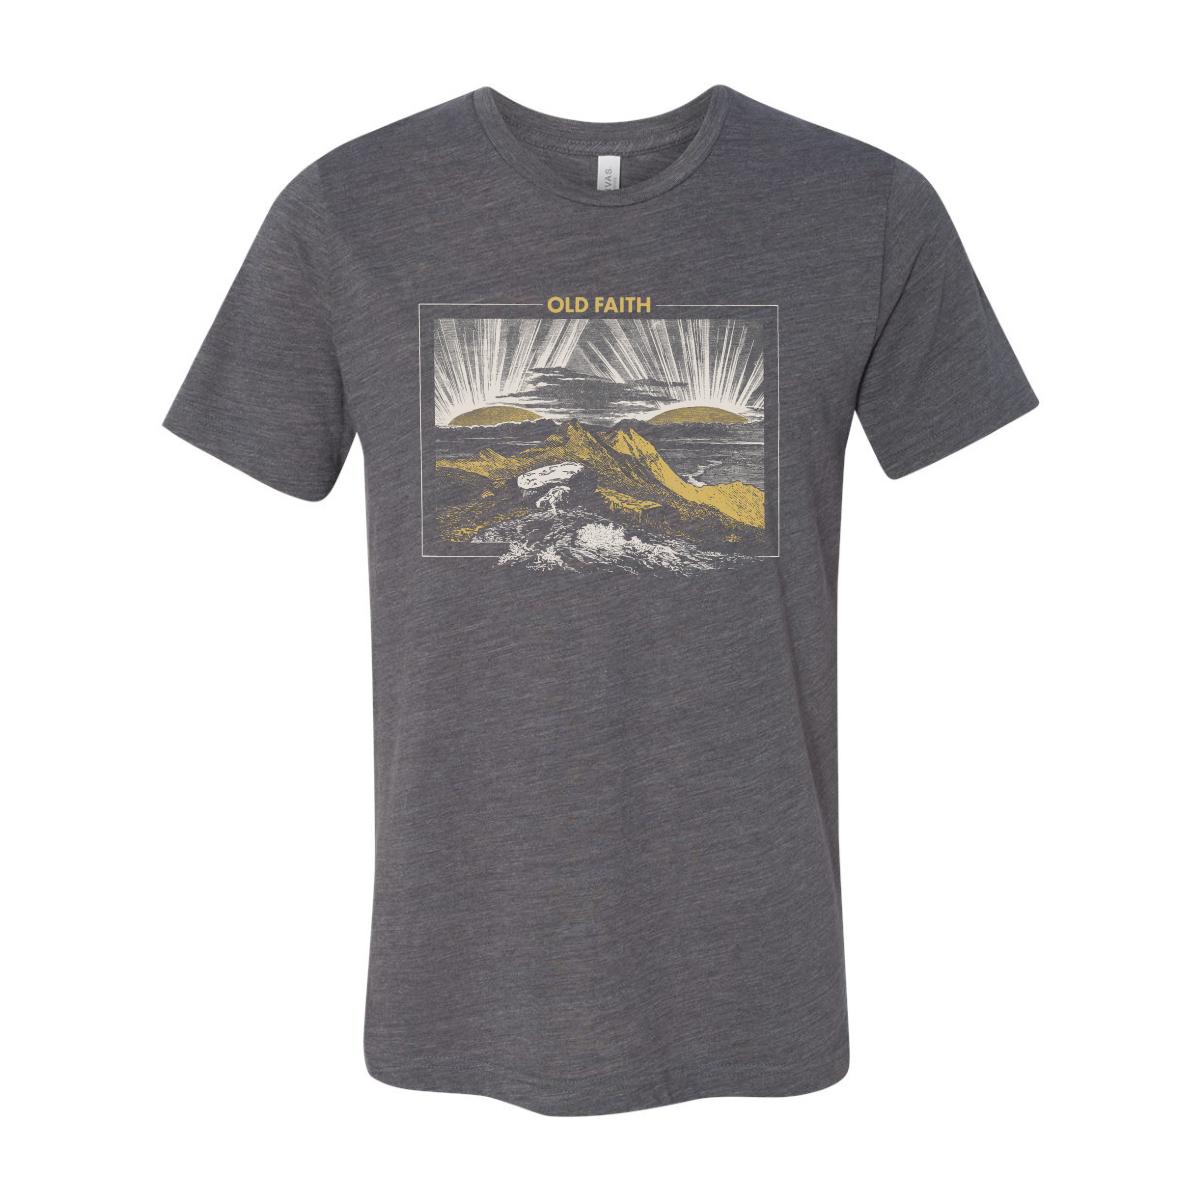 Old Faith - Mountains